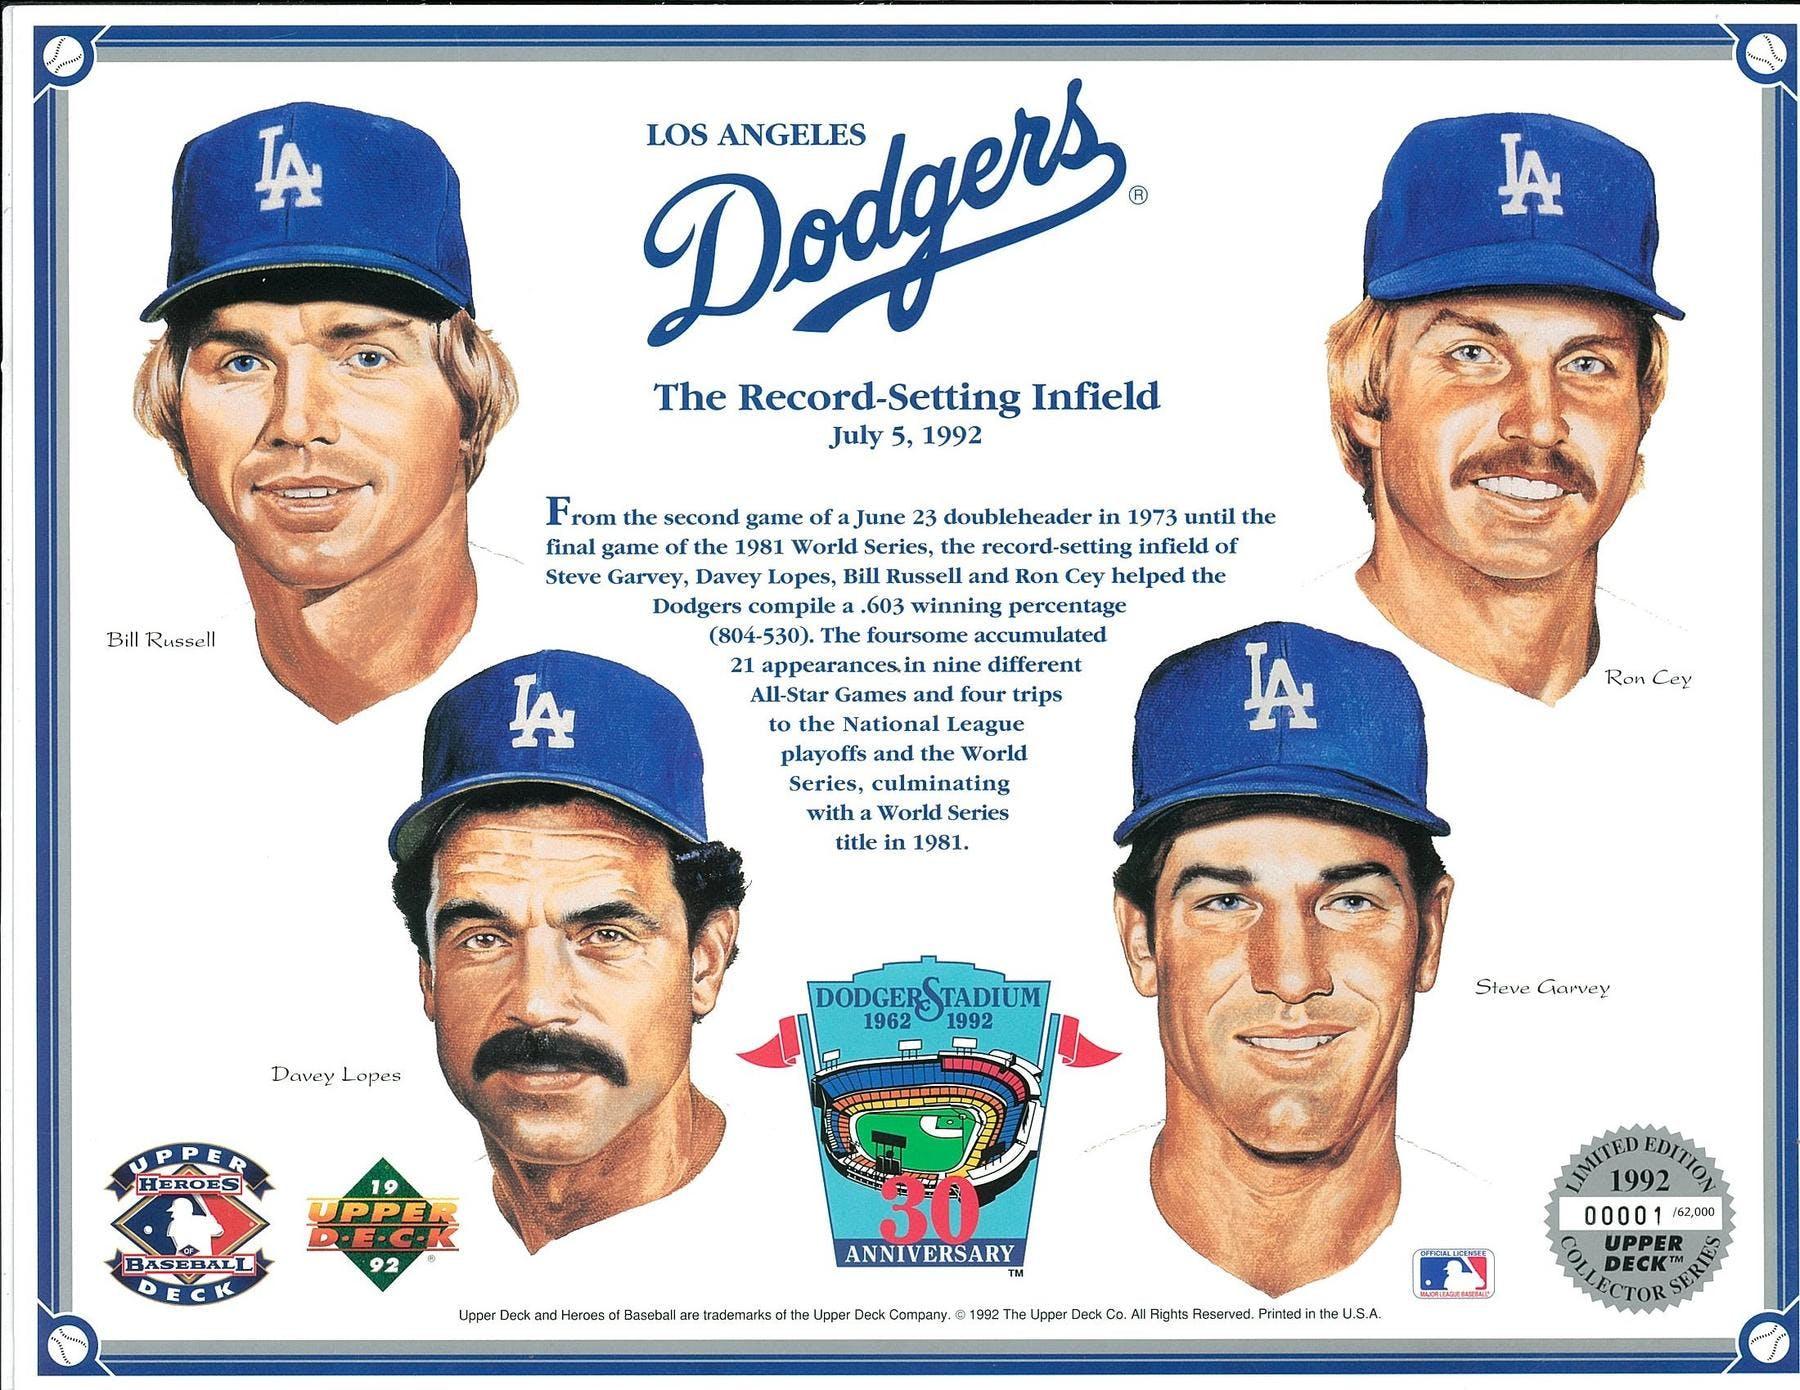 1992 Upper Deck Heroes Of Baseball La Dodgers Record Setting Infield Commemorative Sheet